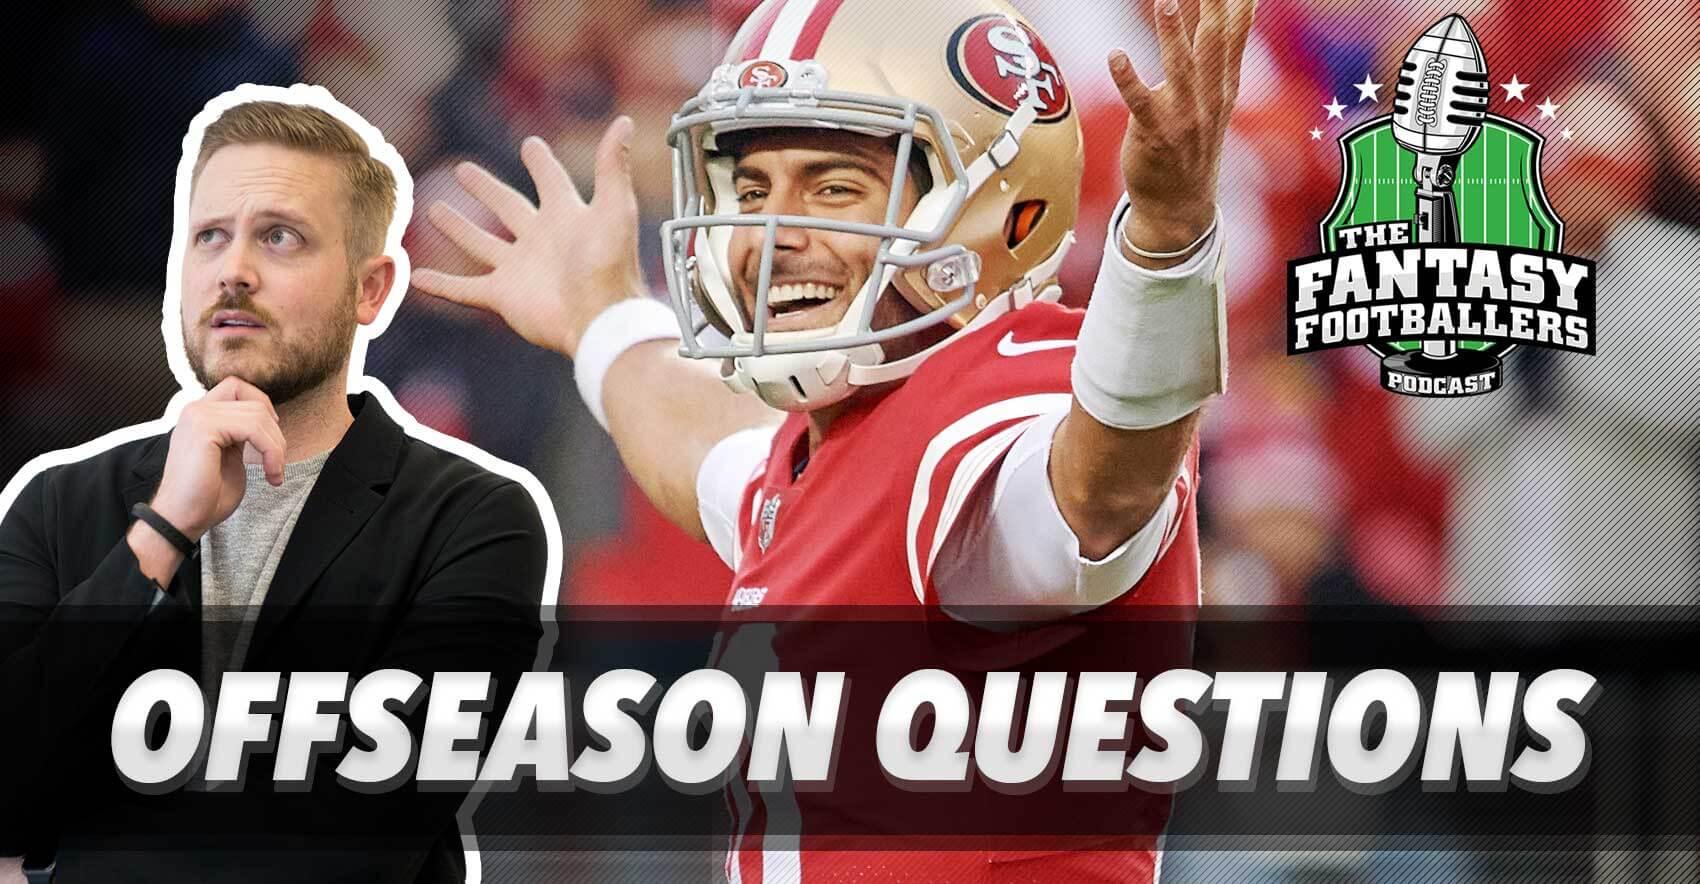 Big Offseason Questions + Combine Hype - Ep. #527